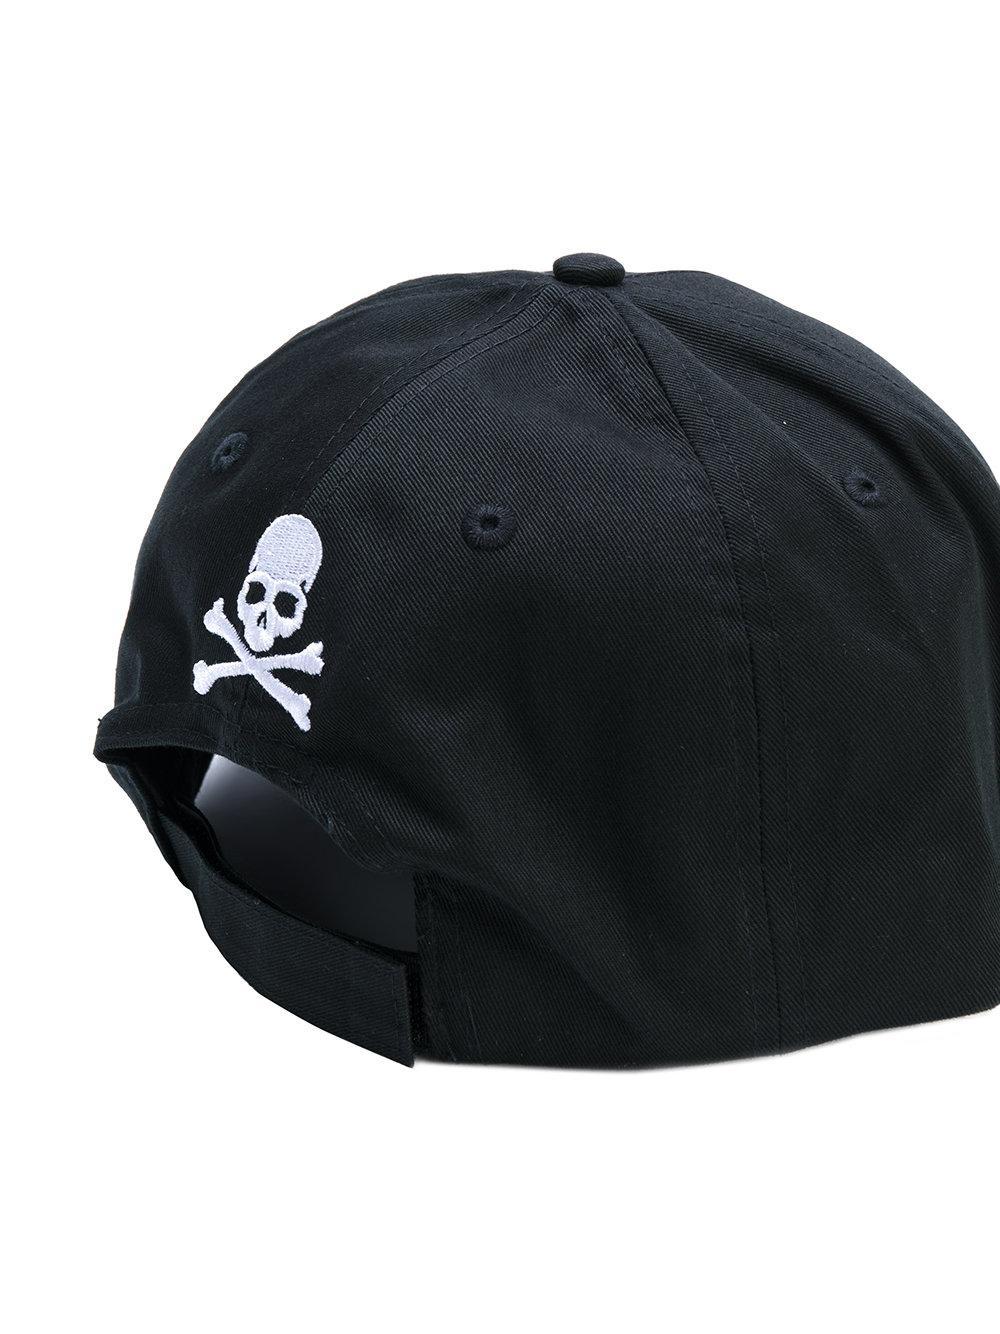 philipp plein indialantic baseball cap in black for men lyst. Black Bedroom Furniture Sets. Home Design Ideas